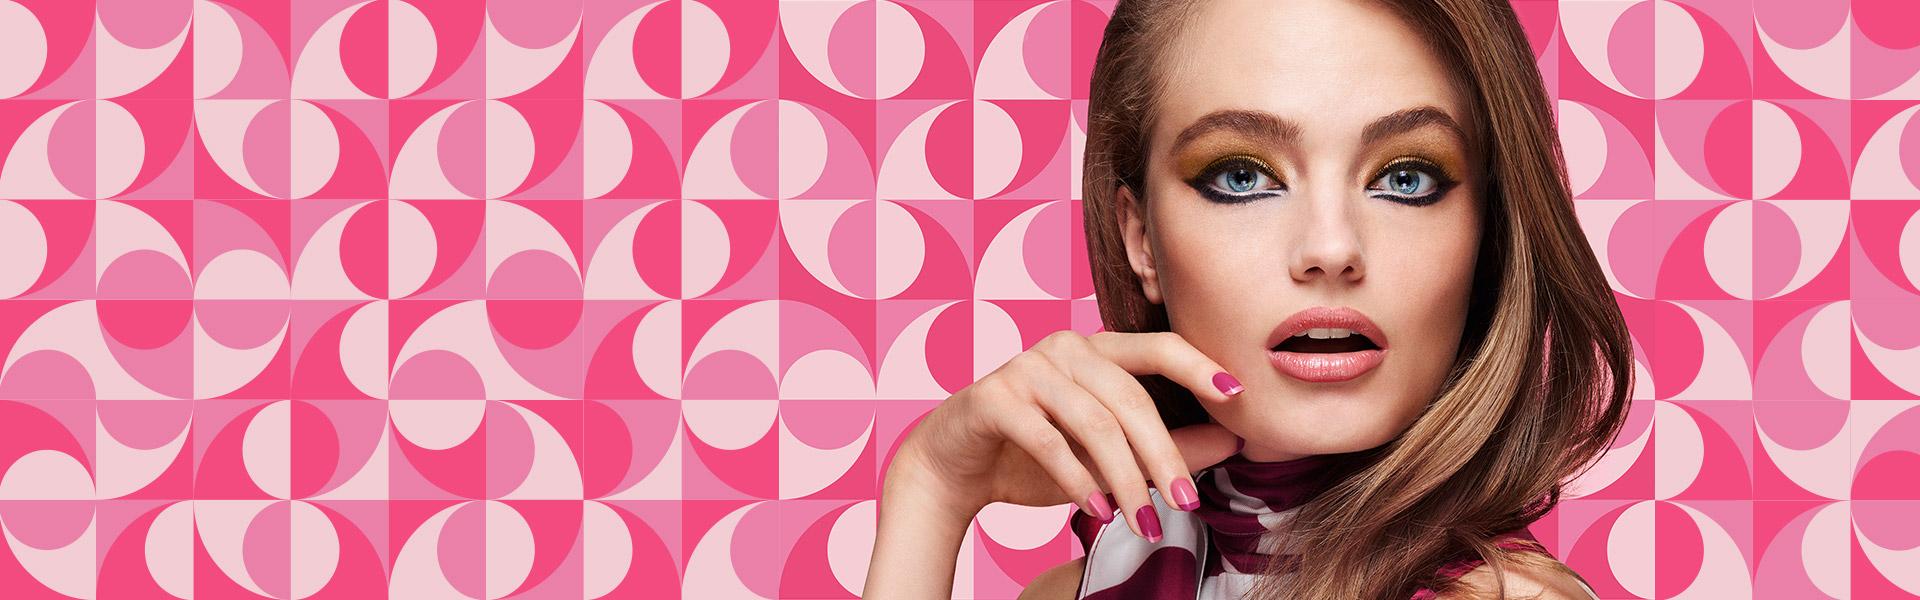 Calendrier De Lavent Kiko 2019.Kiko Milano Boutique En Ligne De Cosmetiques Maquillage